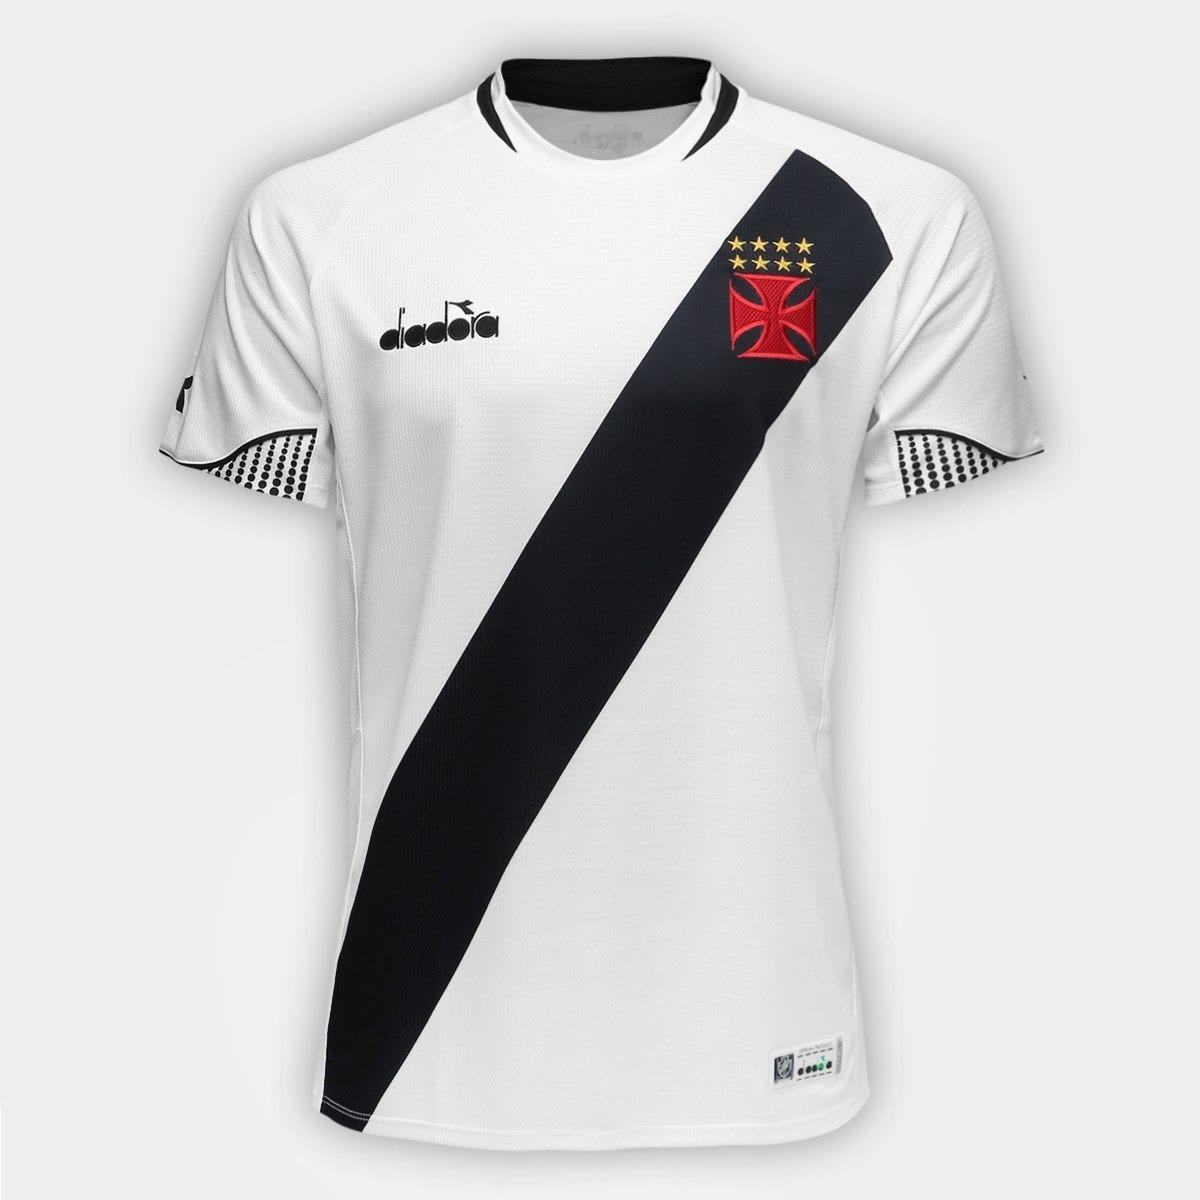 Camisa Camiseta Blusa Time Futebol Vasco Da Gama Adulto 2018 - R ... a3d7c56b1d92f